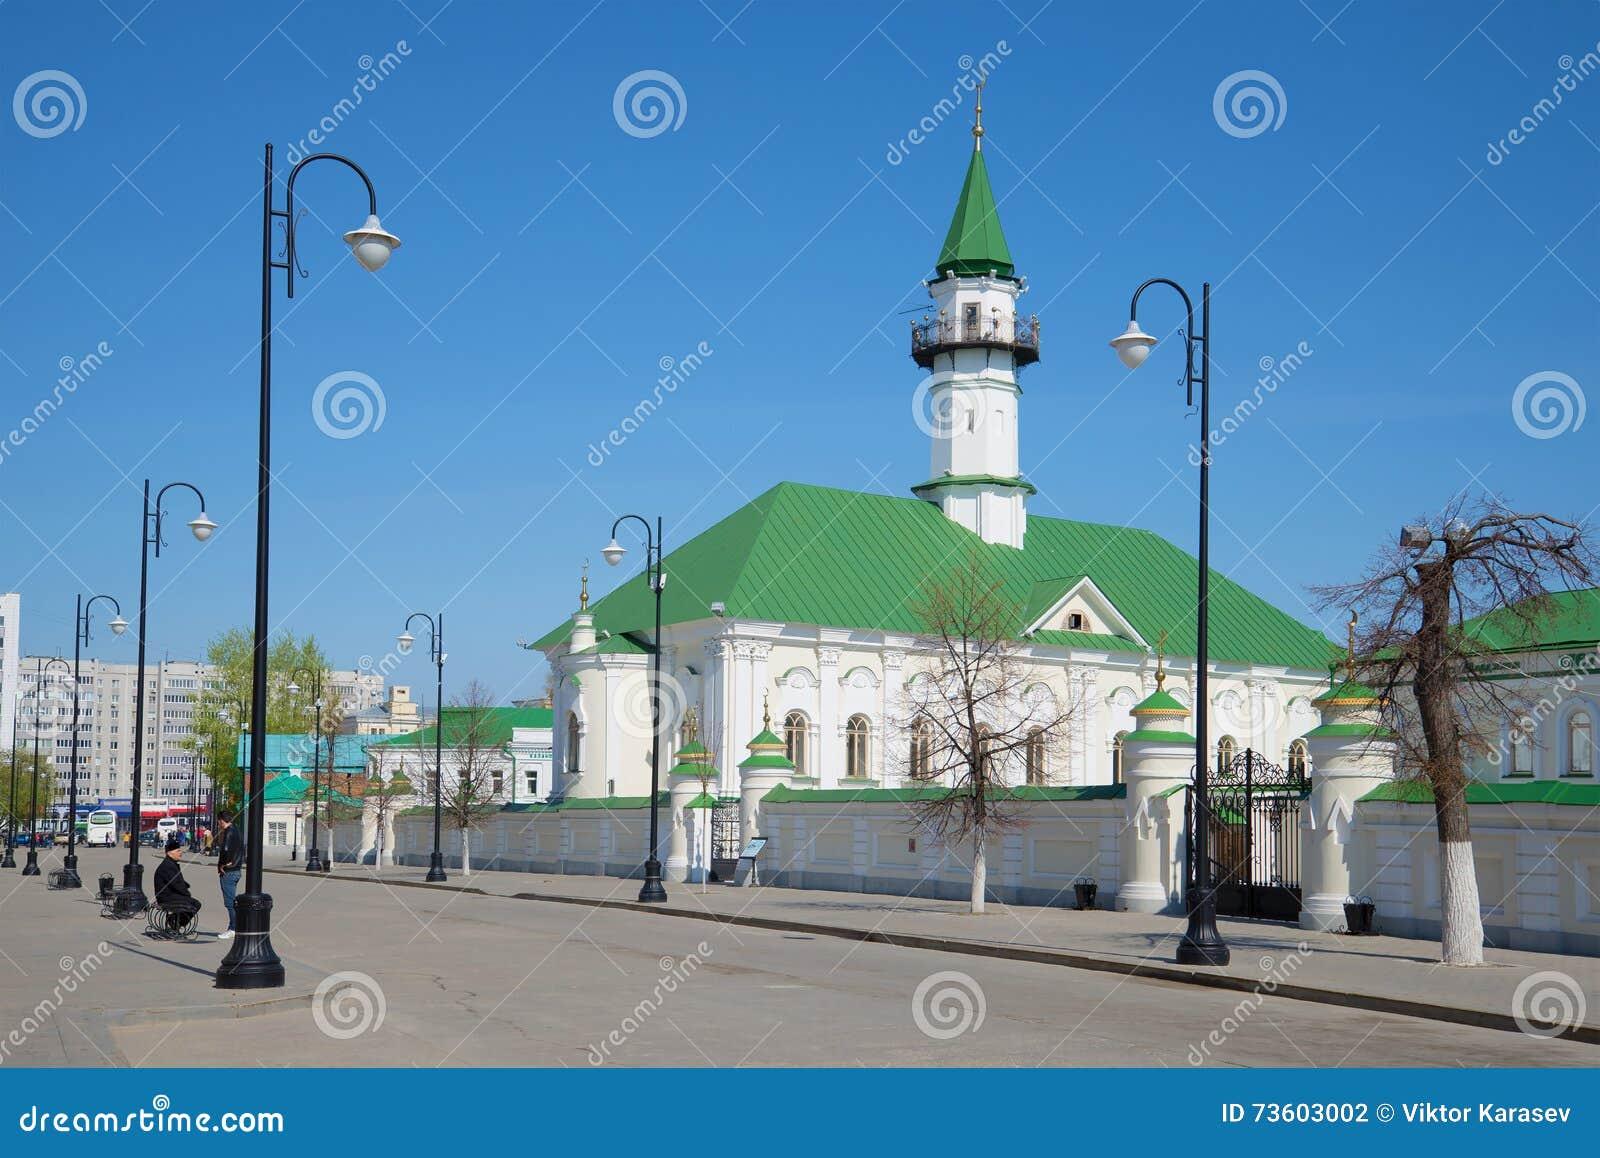 Al Marjani - mosque in Kazan: description, history, relics and shrines 96